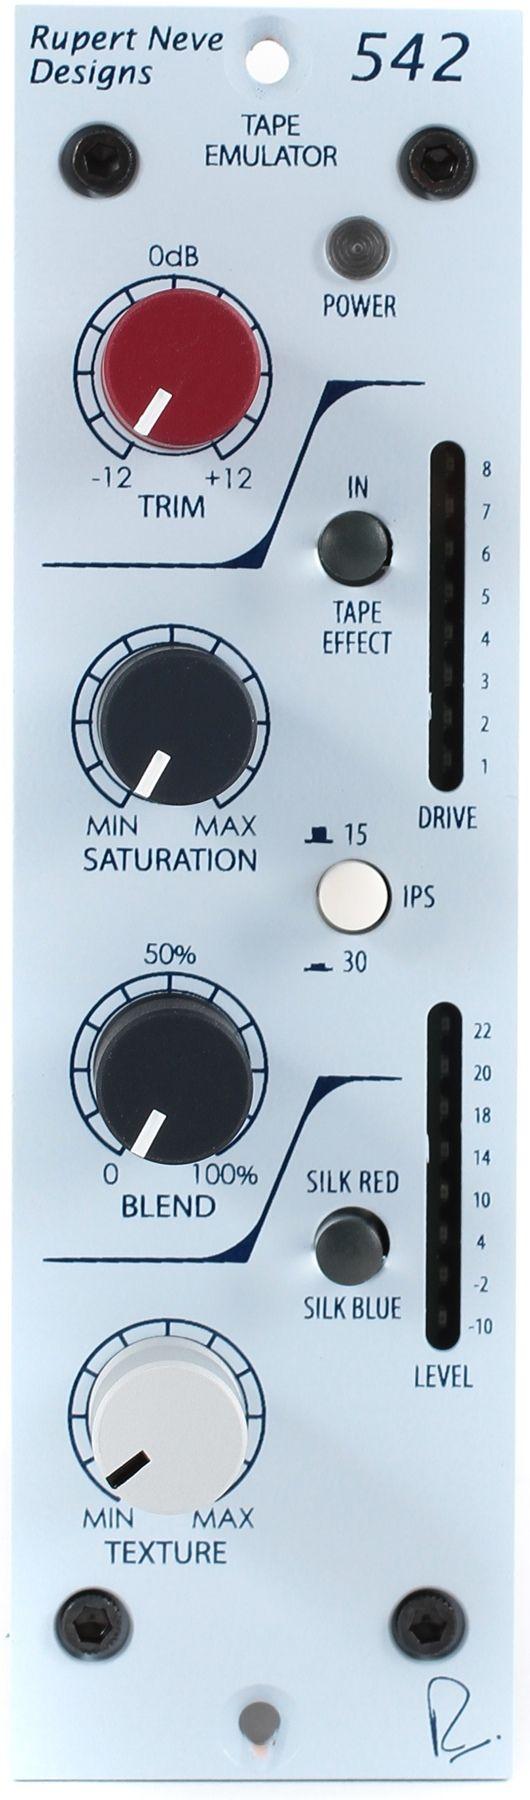 Rupert Neve Designs 542 Tape Emulator - Neve saturation tape emulator. Neve has always been a pioneer in recording technology